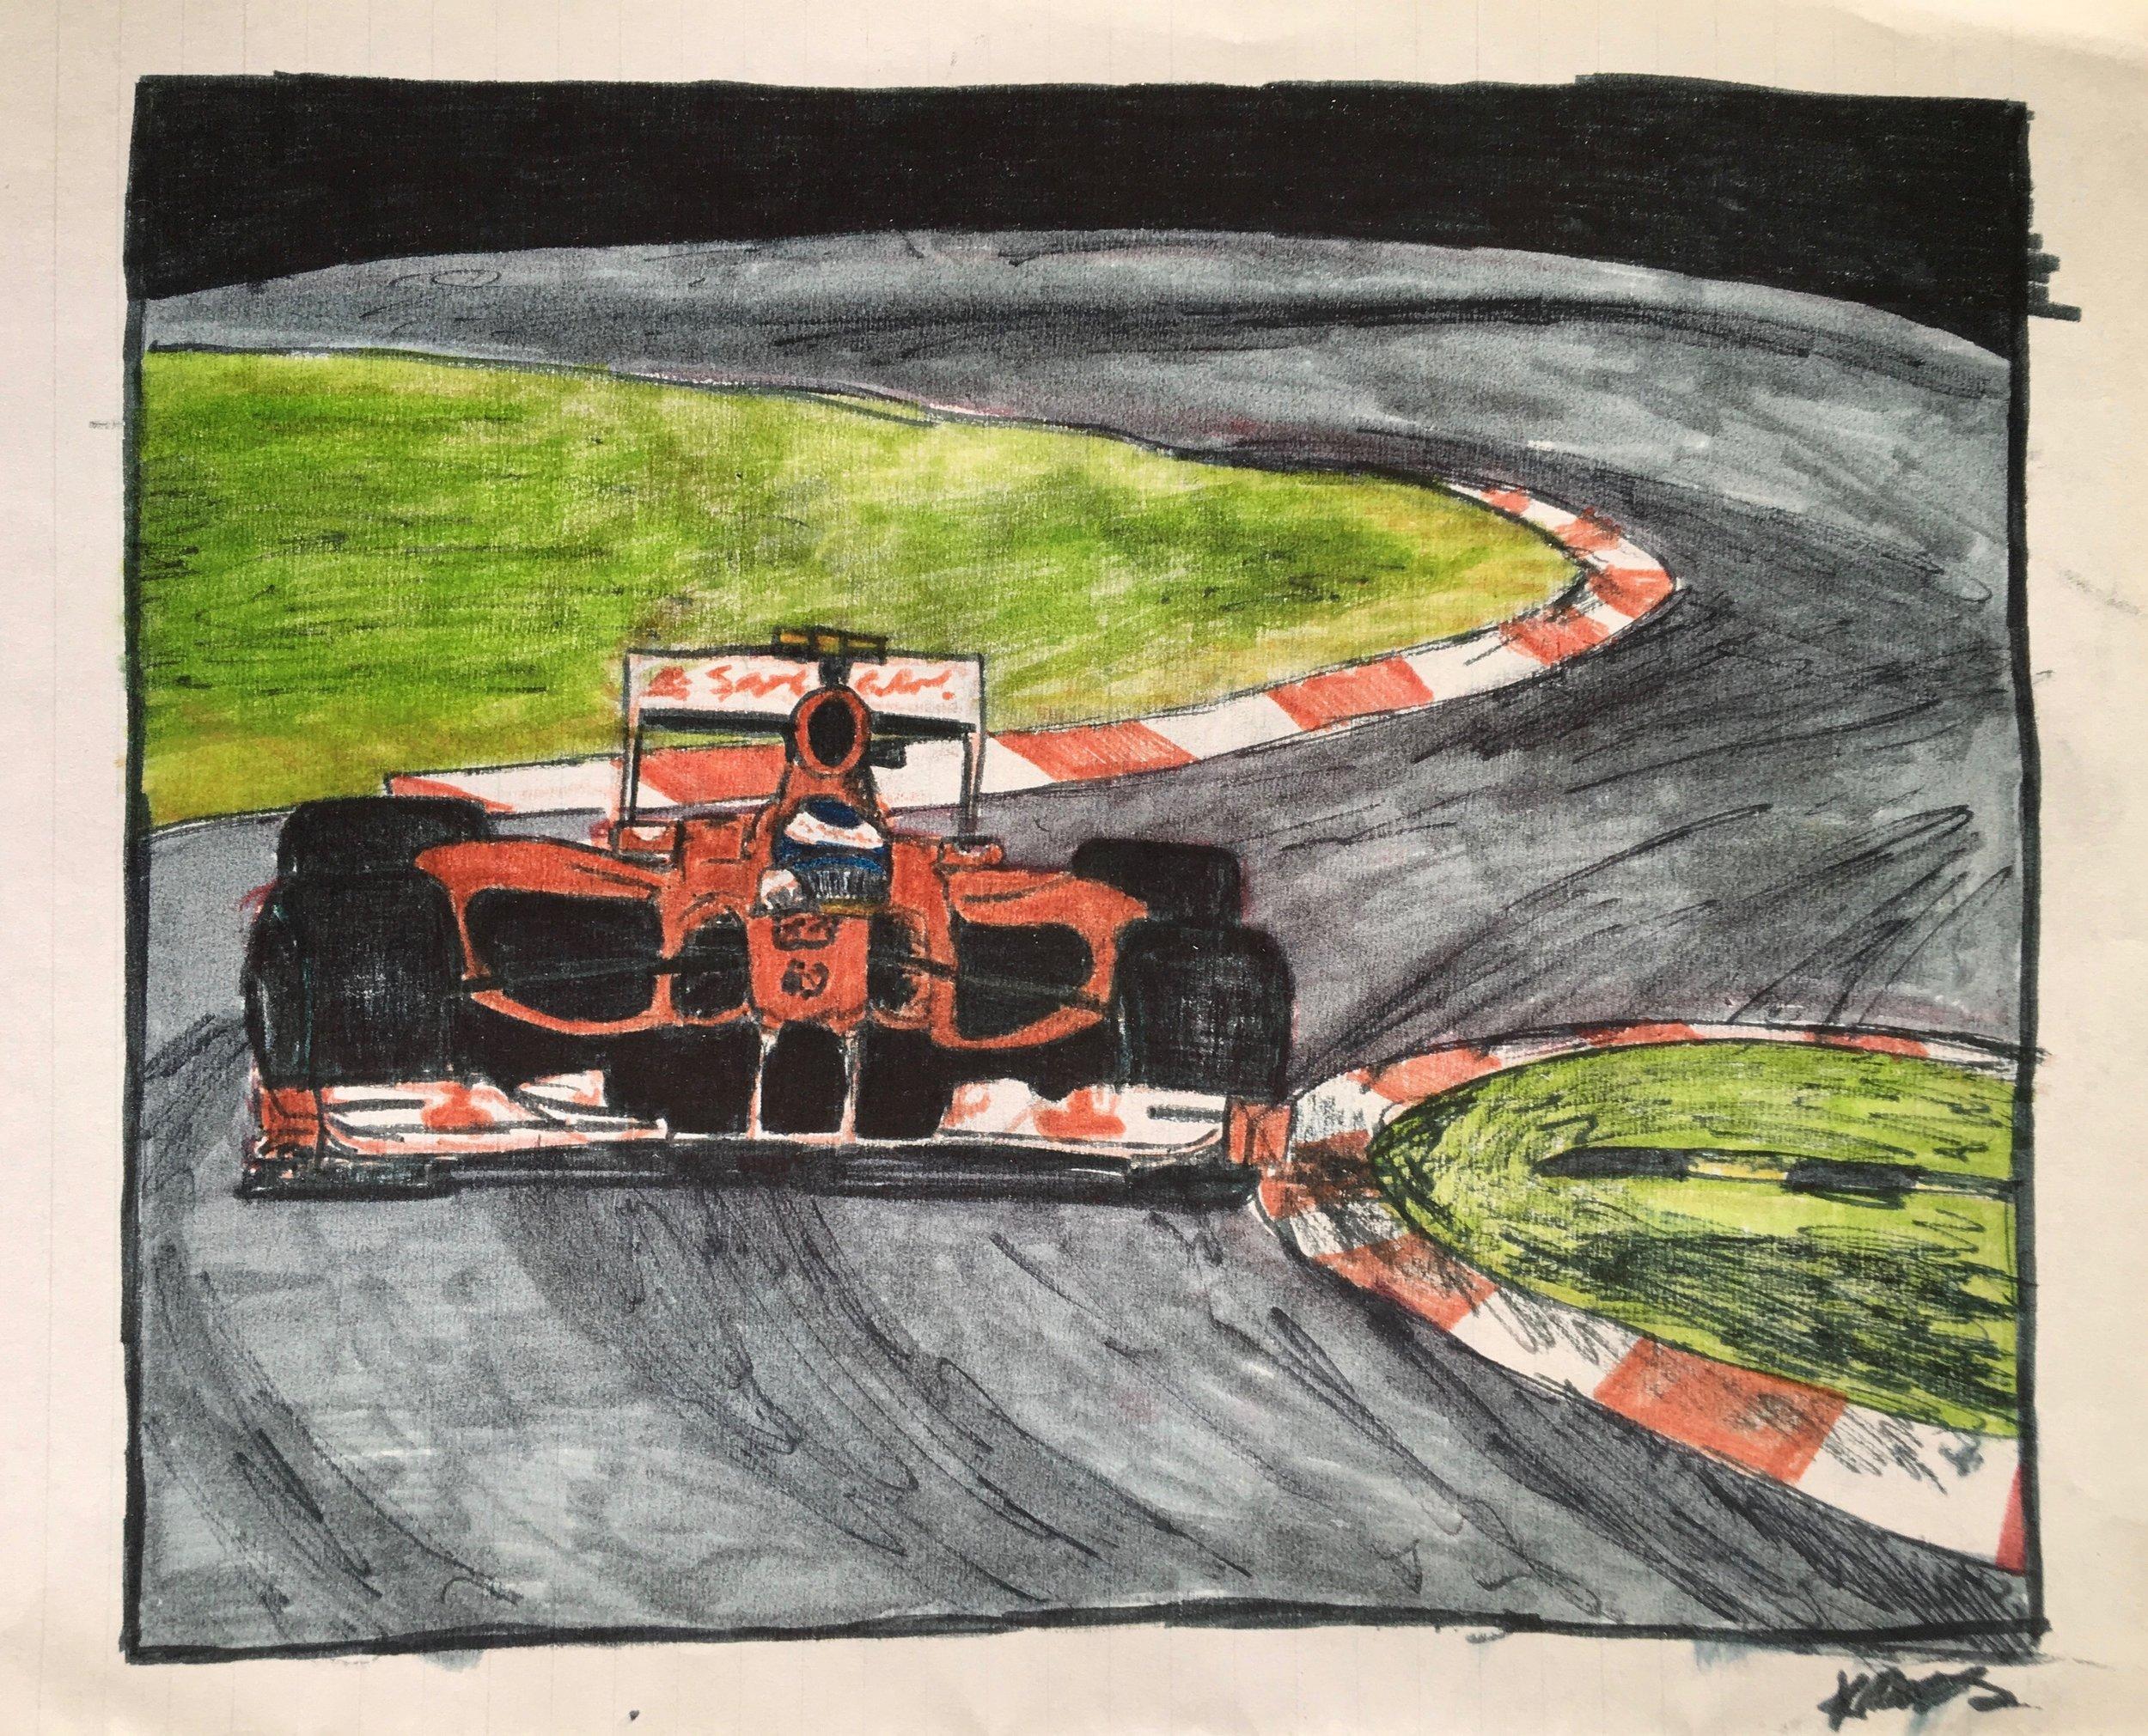 Alonso, Monza 2010